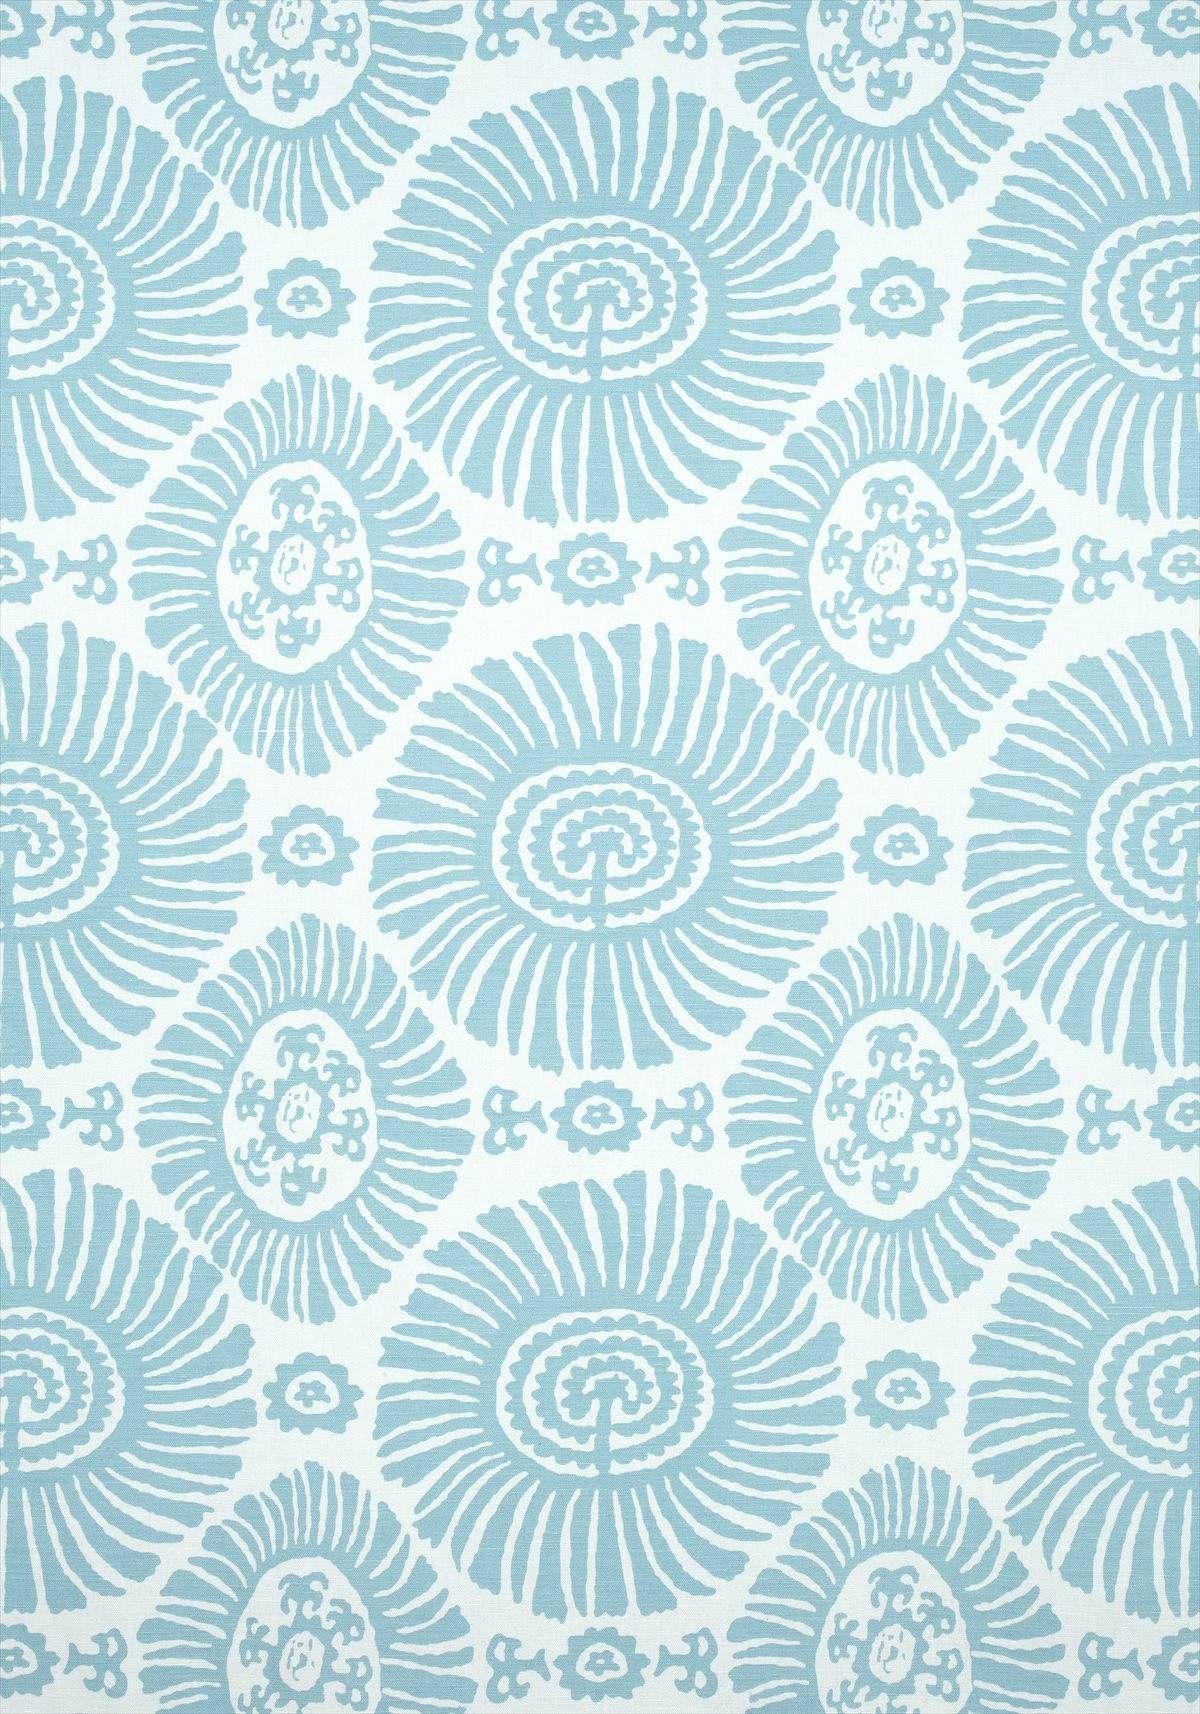 Pin On Designer Fabrics 2019 Tm Interiors Limited